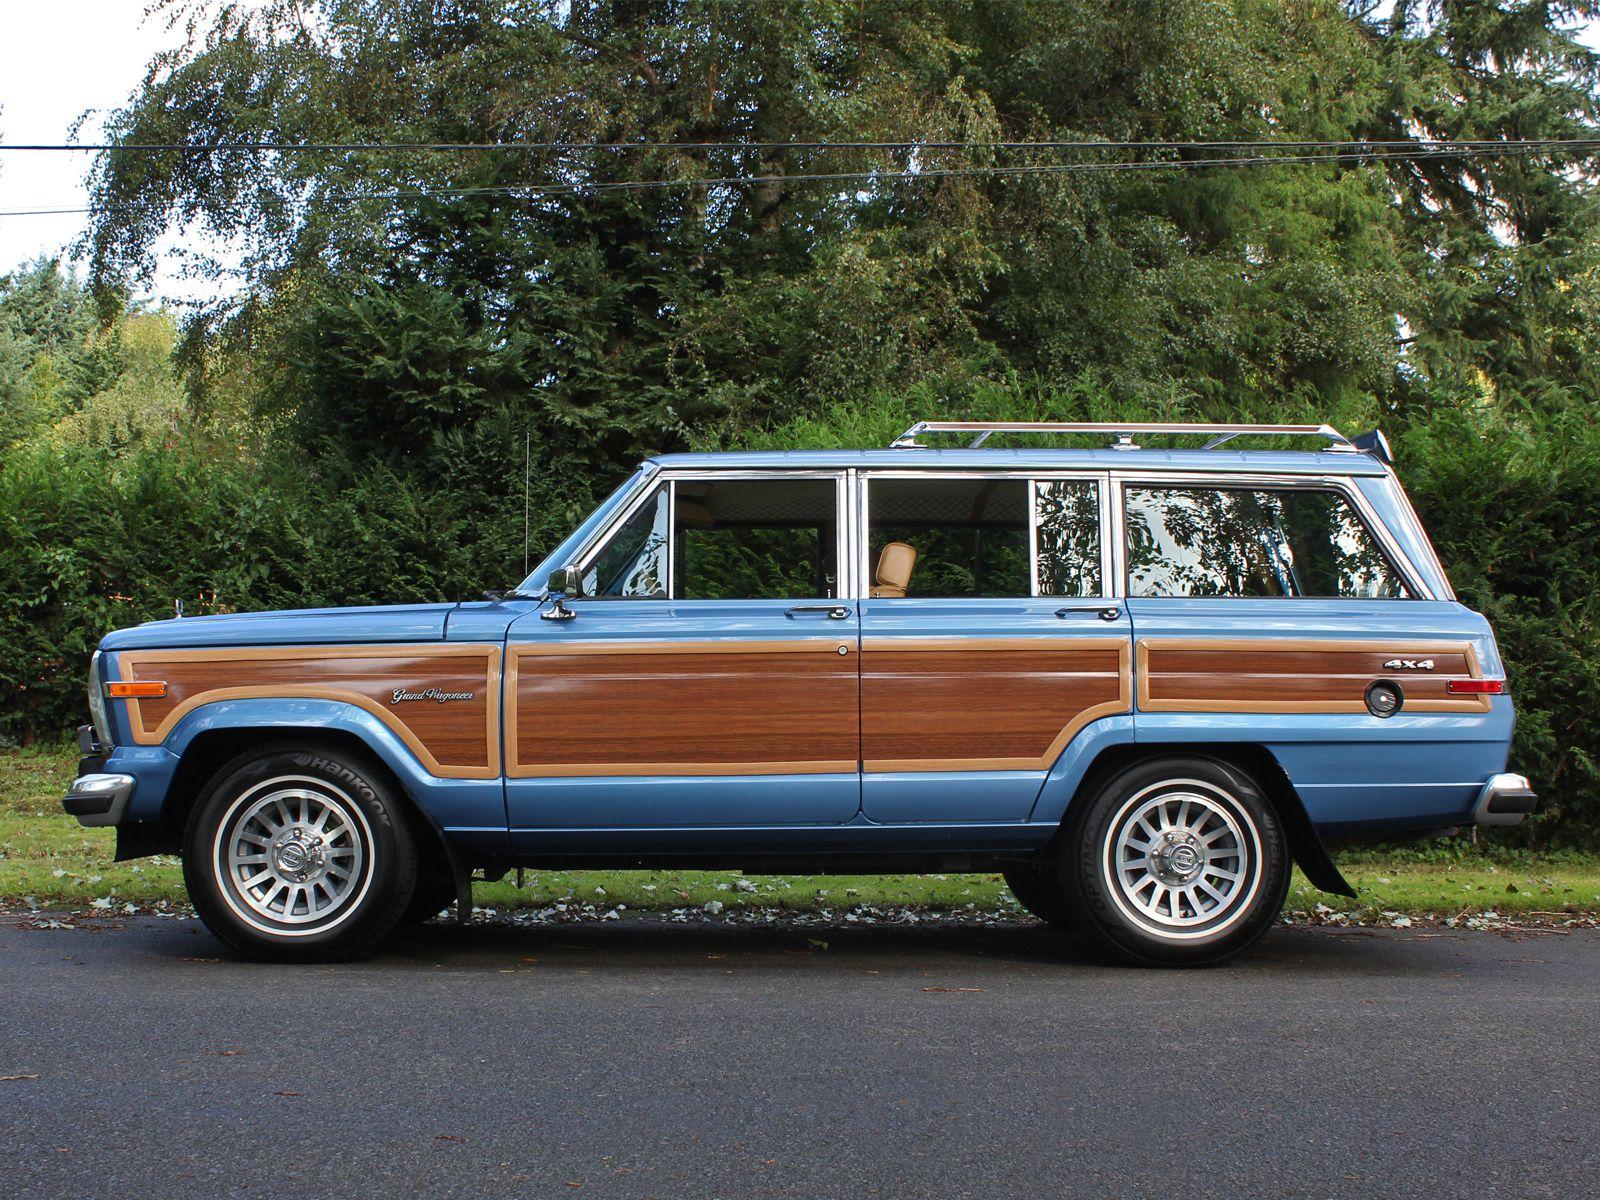 1988 jeep grand wagoneer spinnaker blue jeep wagoneer jeep grand old jeep 1988 jeep grand wagoneer spinnaker